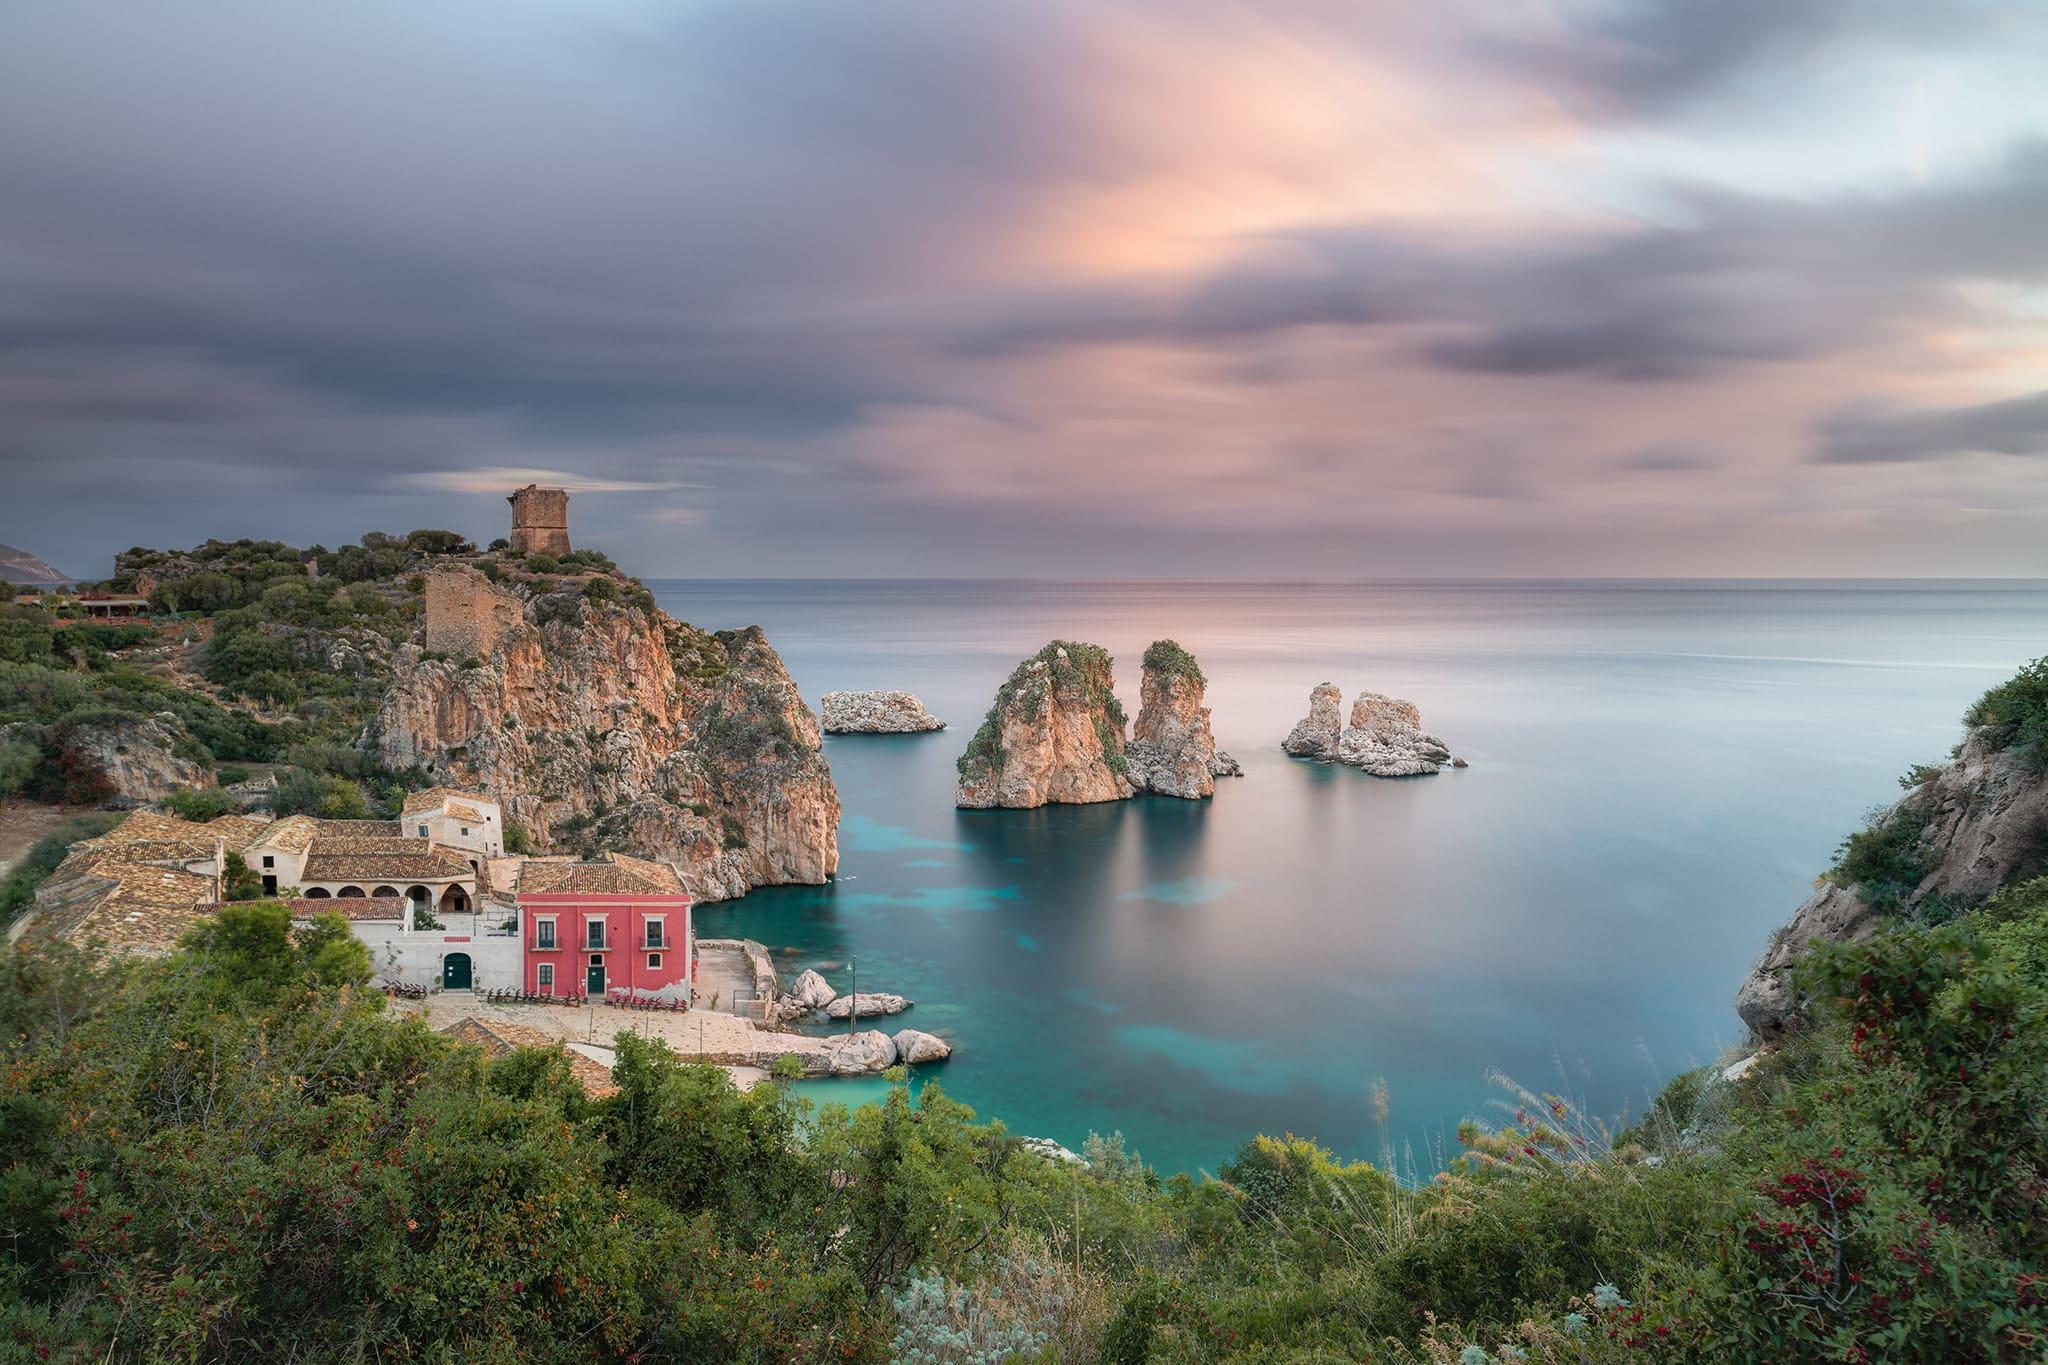 Francesco Gola Tonnara di Scopello Sicilia Sicily Lunga Esposizione Long Exposure Seascape Italy Italia